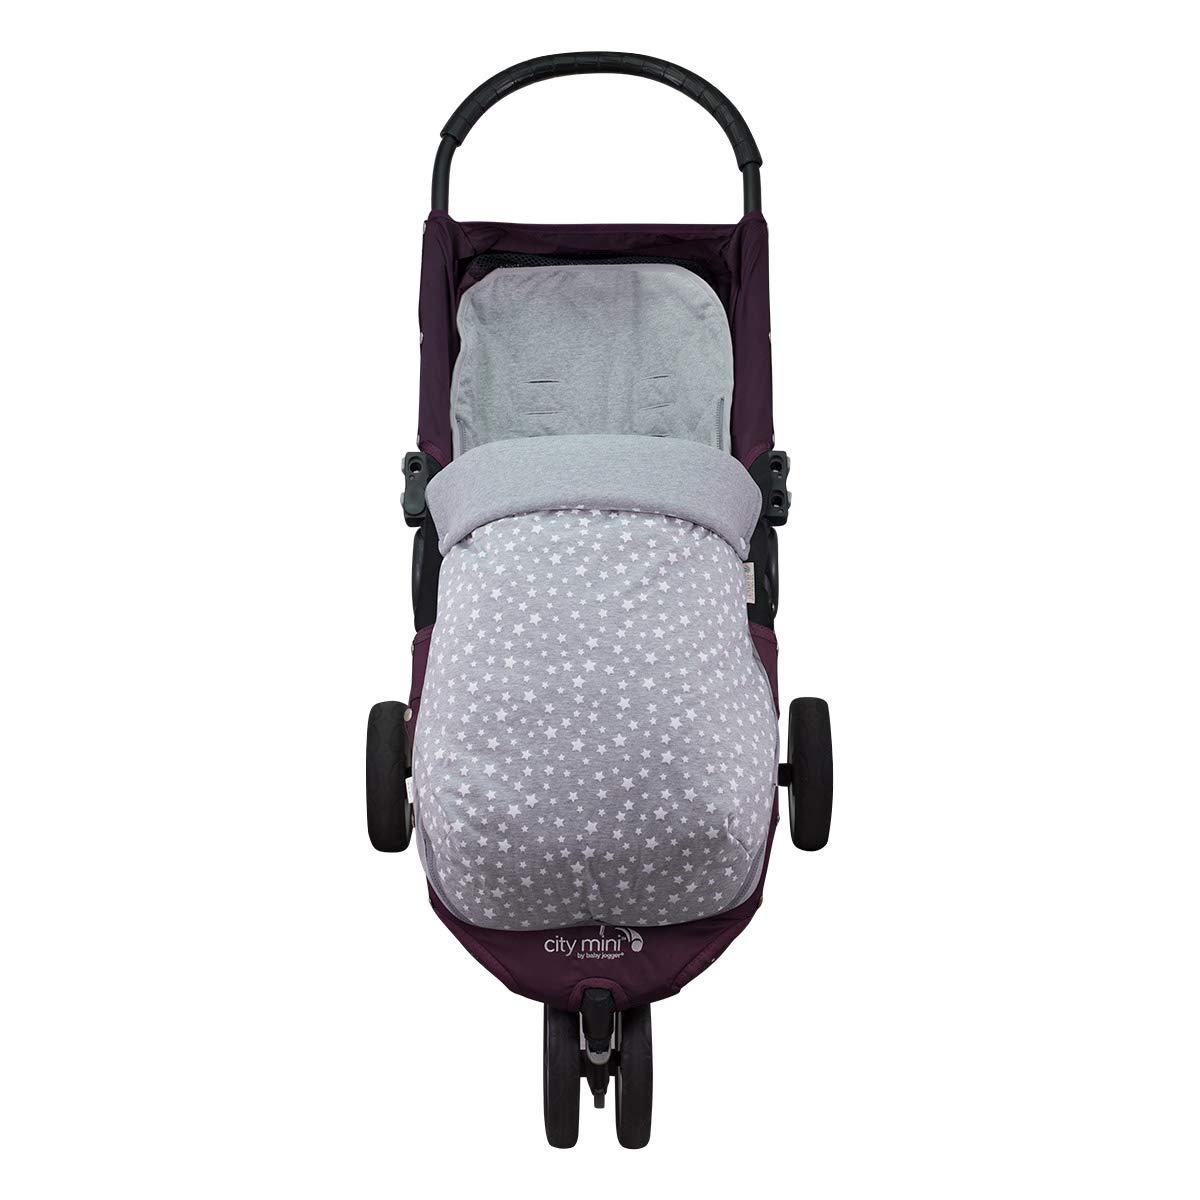 Janabebé Footmuff Baby Sack Jogger City Mini Pushchairs (White Star, Cotton)